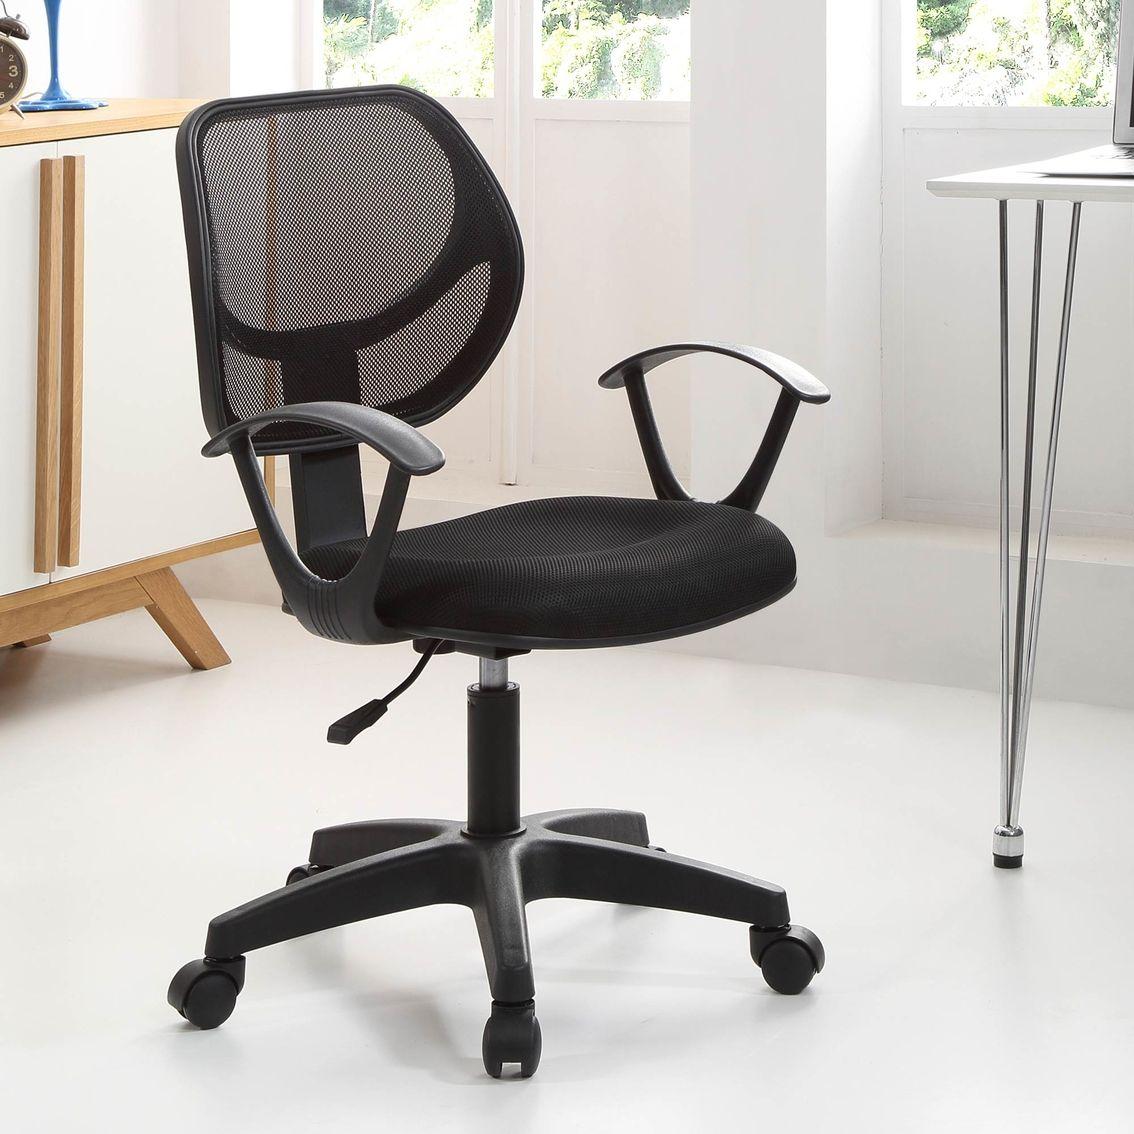 Phenomenal Hodedah Mesh Back Desk Chairitem 8631577 List Price Inzonedesignstudio Interior Chair Design Inzonedesignstudiocom